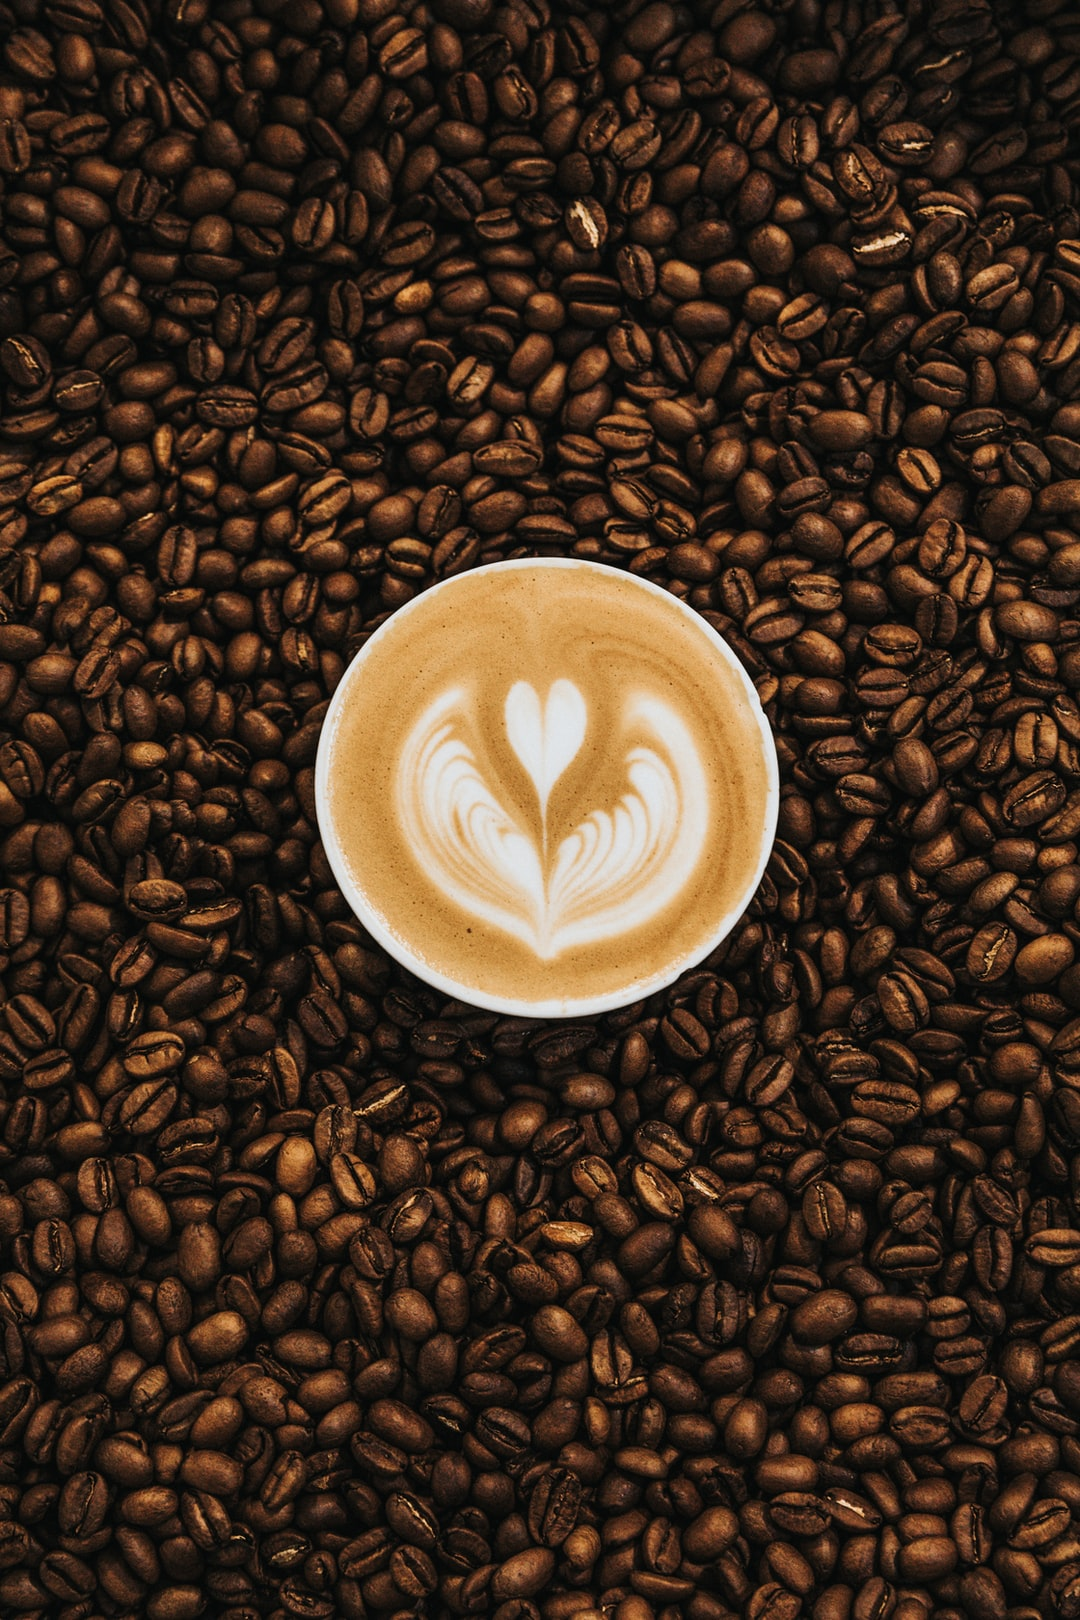 top view photography of heart latte u003cbu003ecoffeeu003c/bu003e photo u2013 Free u003cbu003eCoffeeu003c/bu003e Image ...